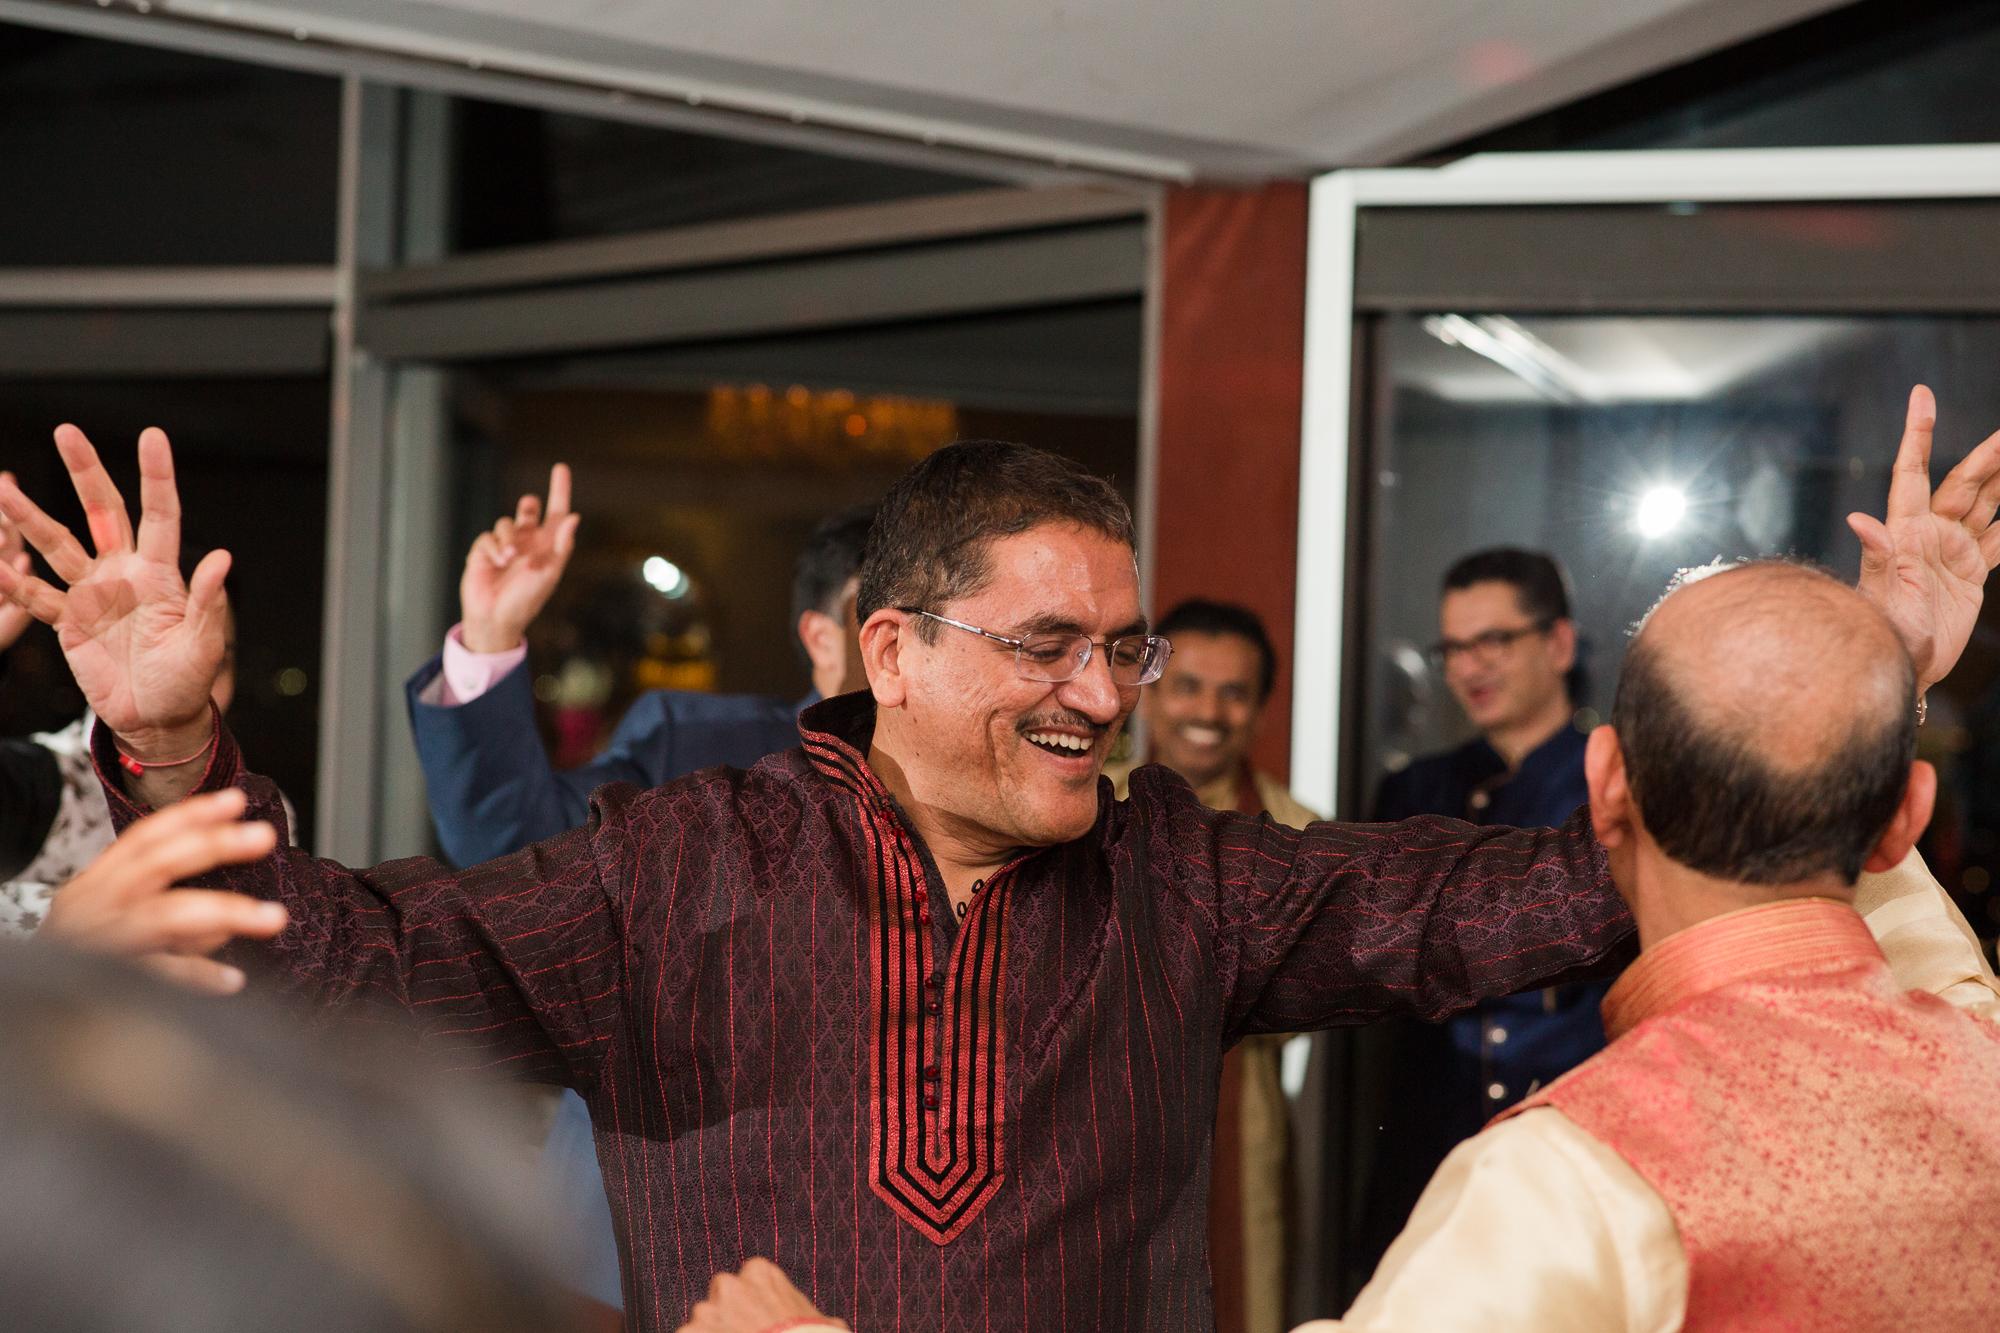 anumeet and gopika, indian engagement ring ceremony, top of the town, alexandria, northern virginia, nova weddings-101.jpg